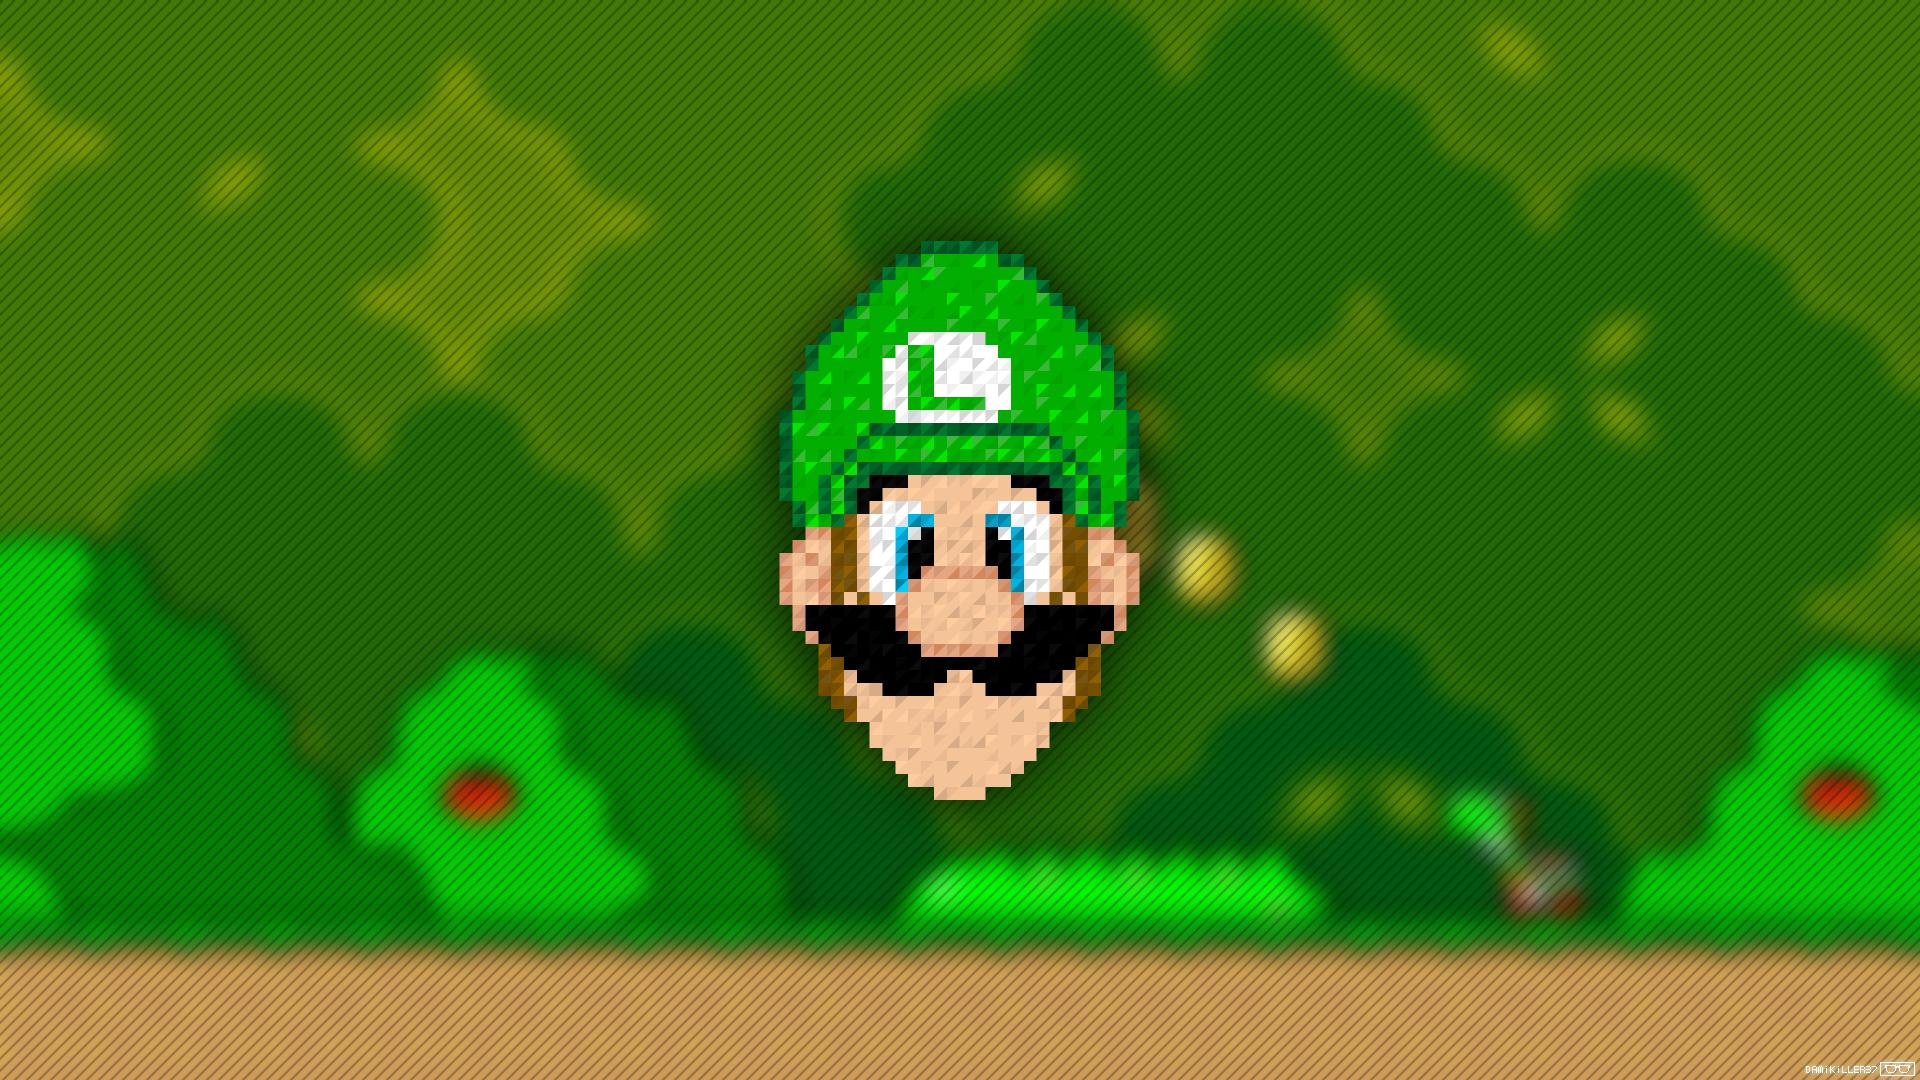 Videojuego - Super Mario World  Luigi Super Mario Pixel Art Fondo de Pantalla